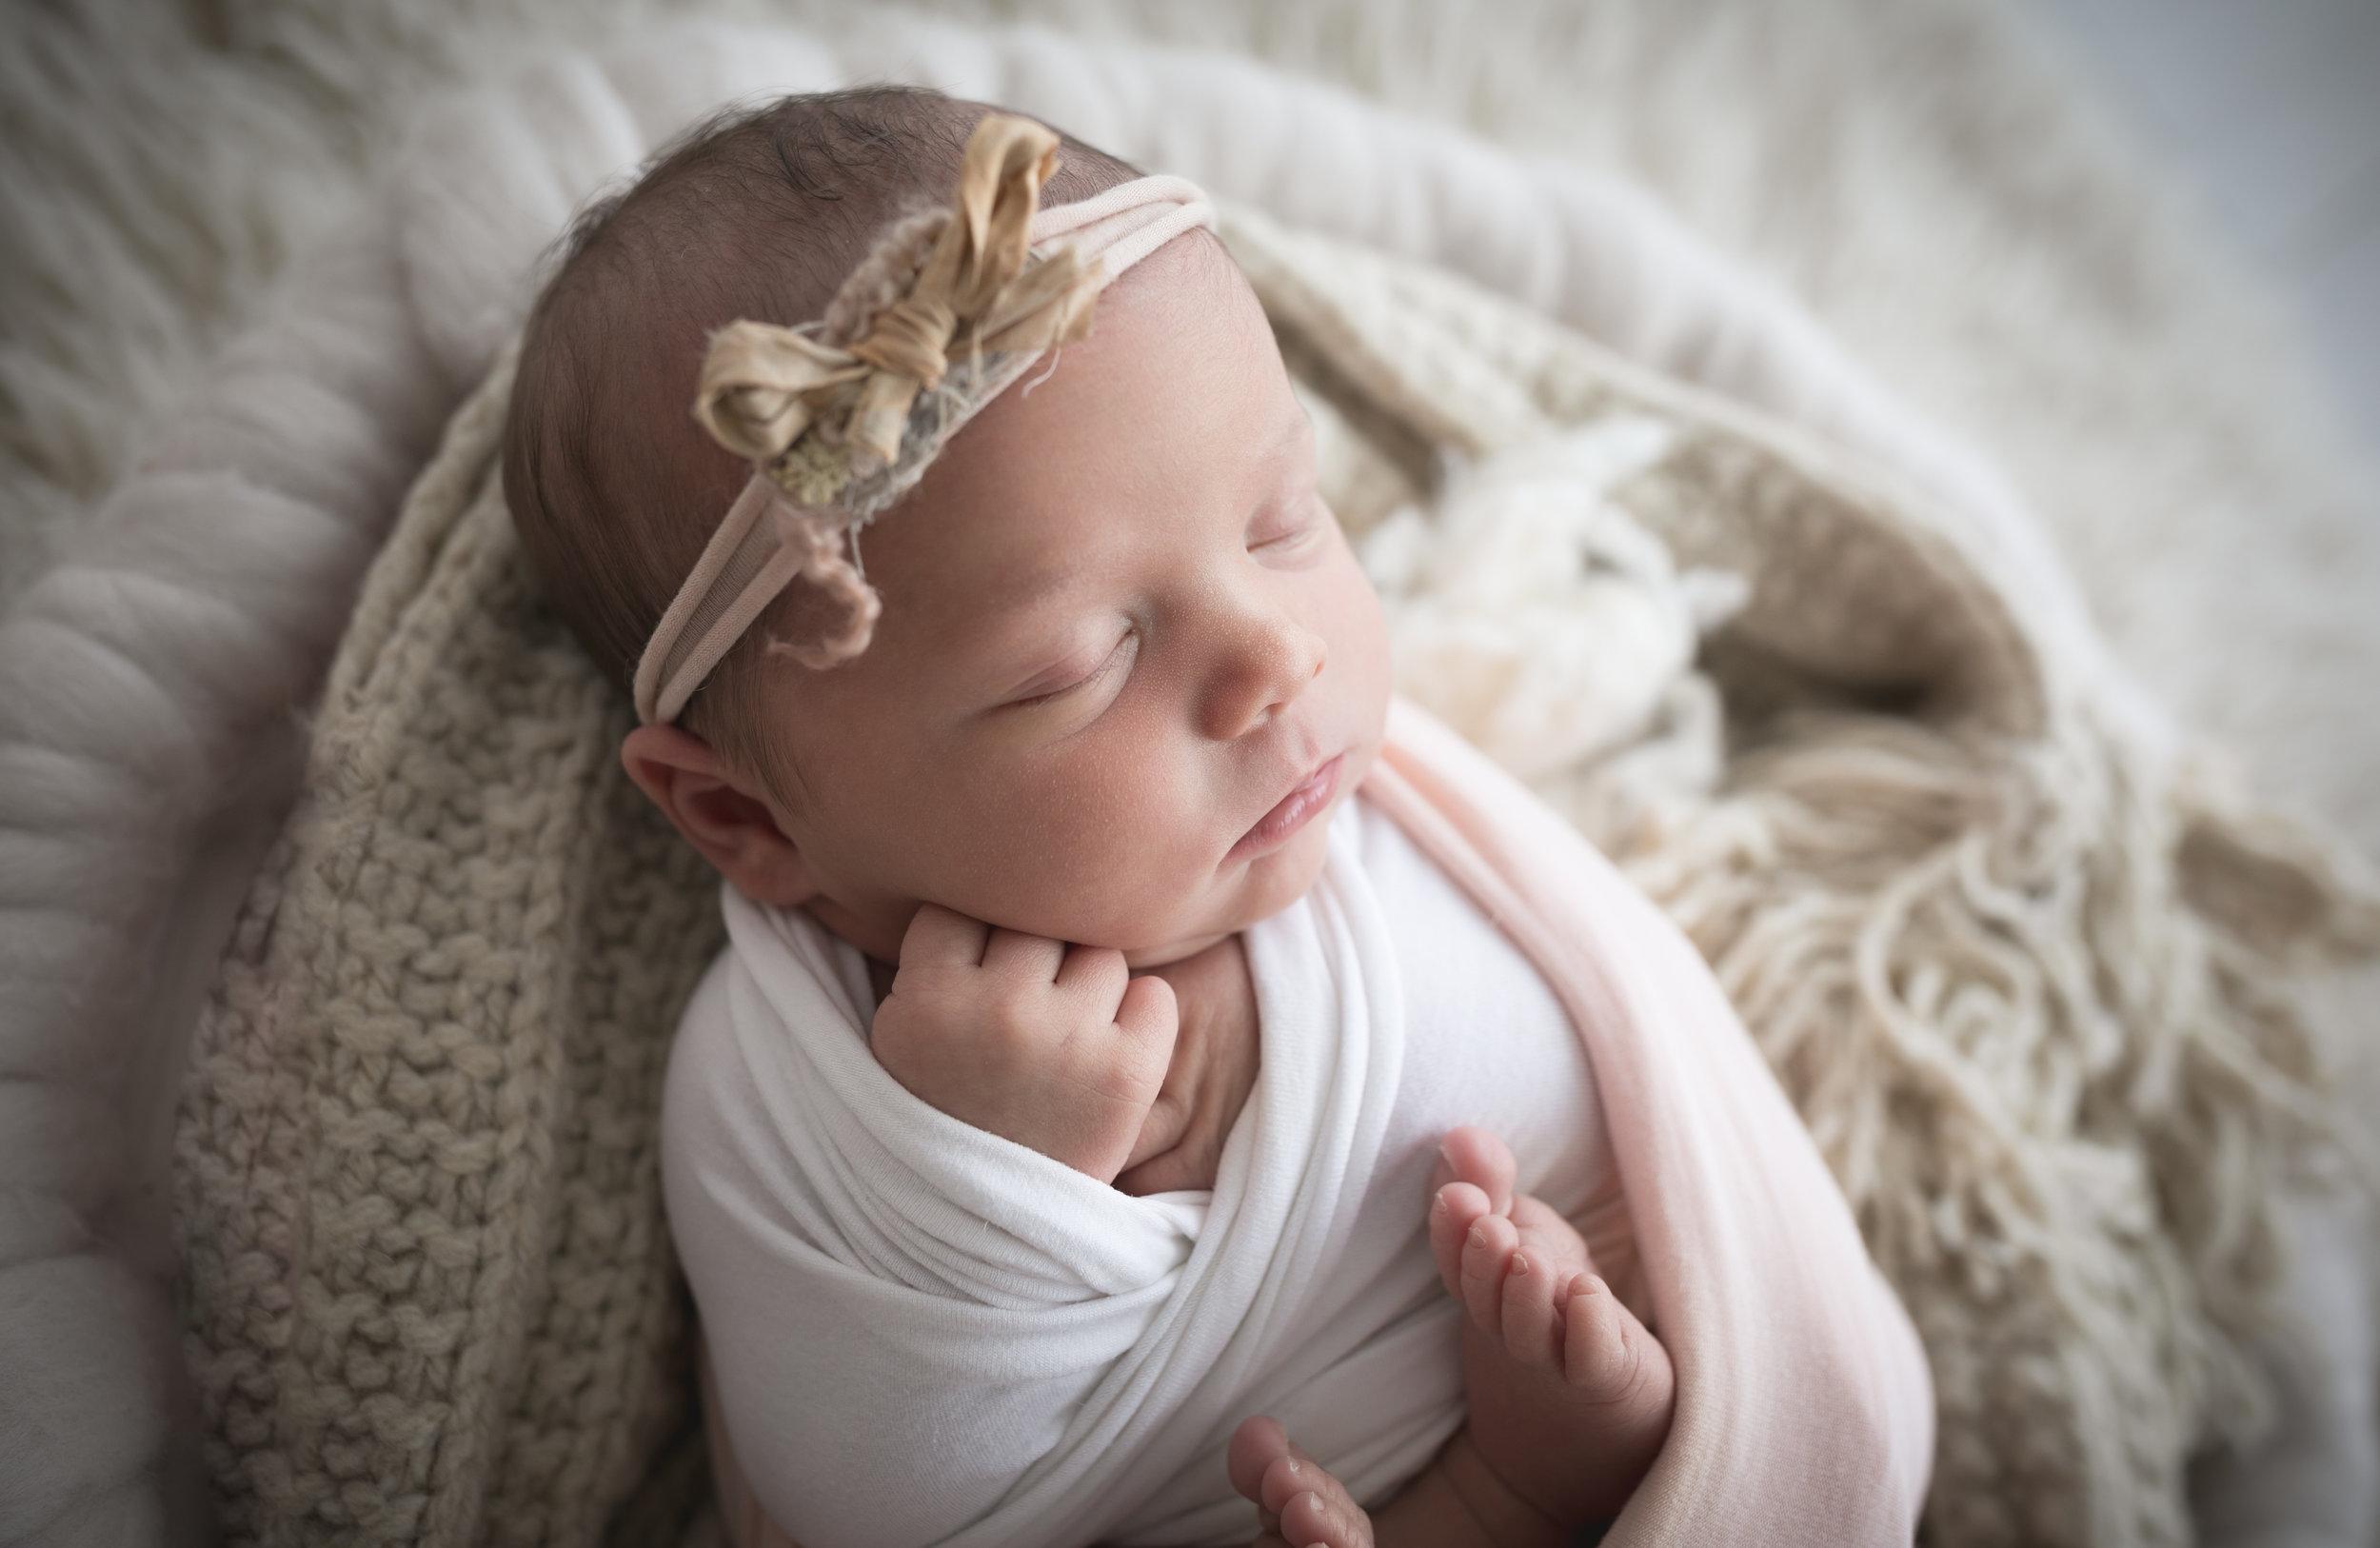 Baby-Photographer-in-Runcorn-Newborn-baby